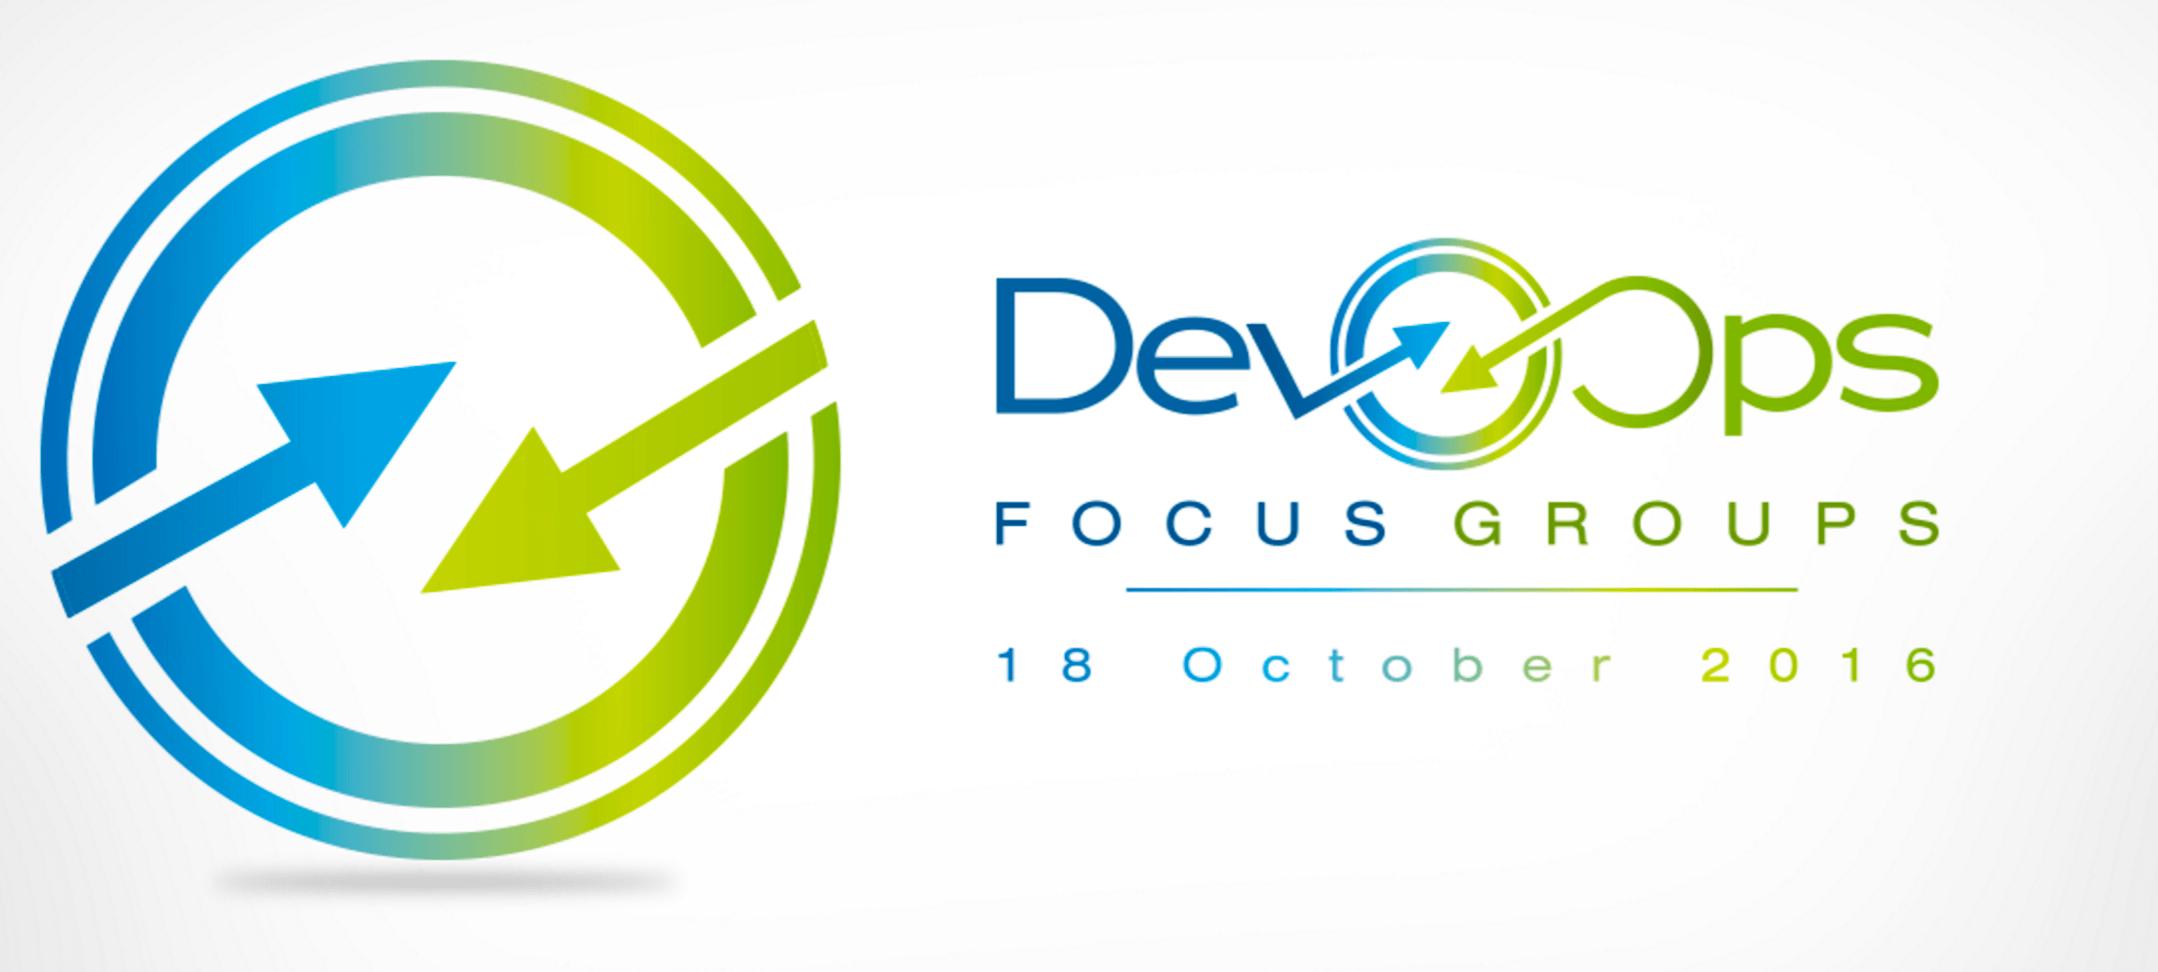 DevOps Focus Groups